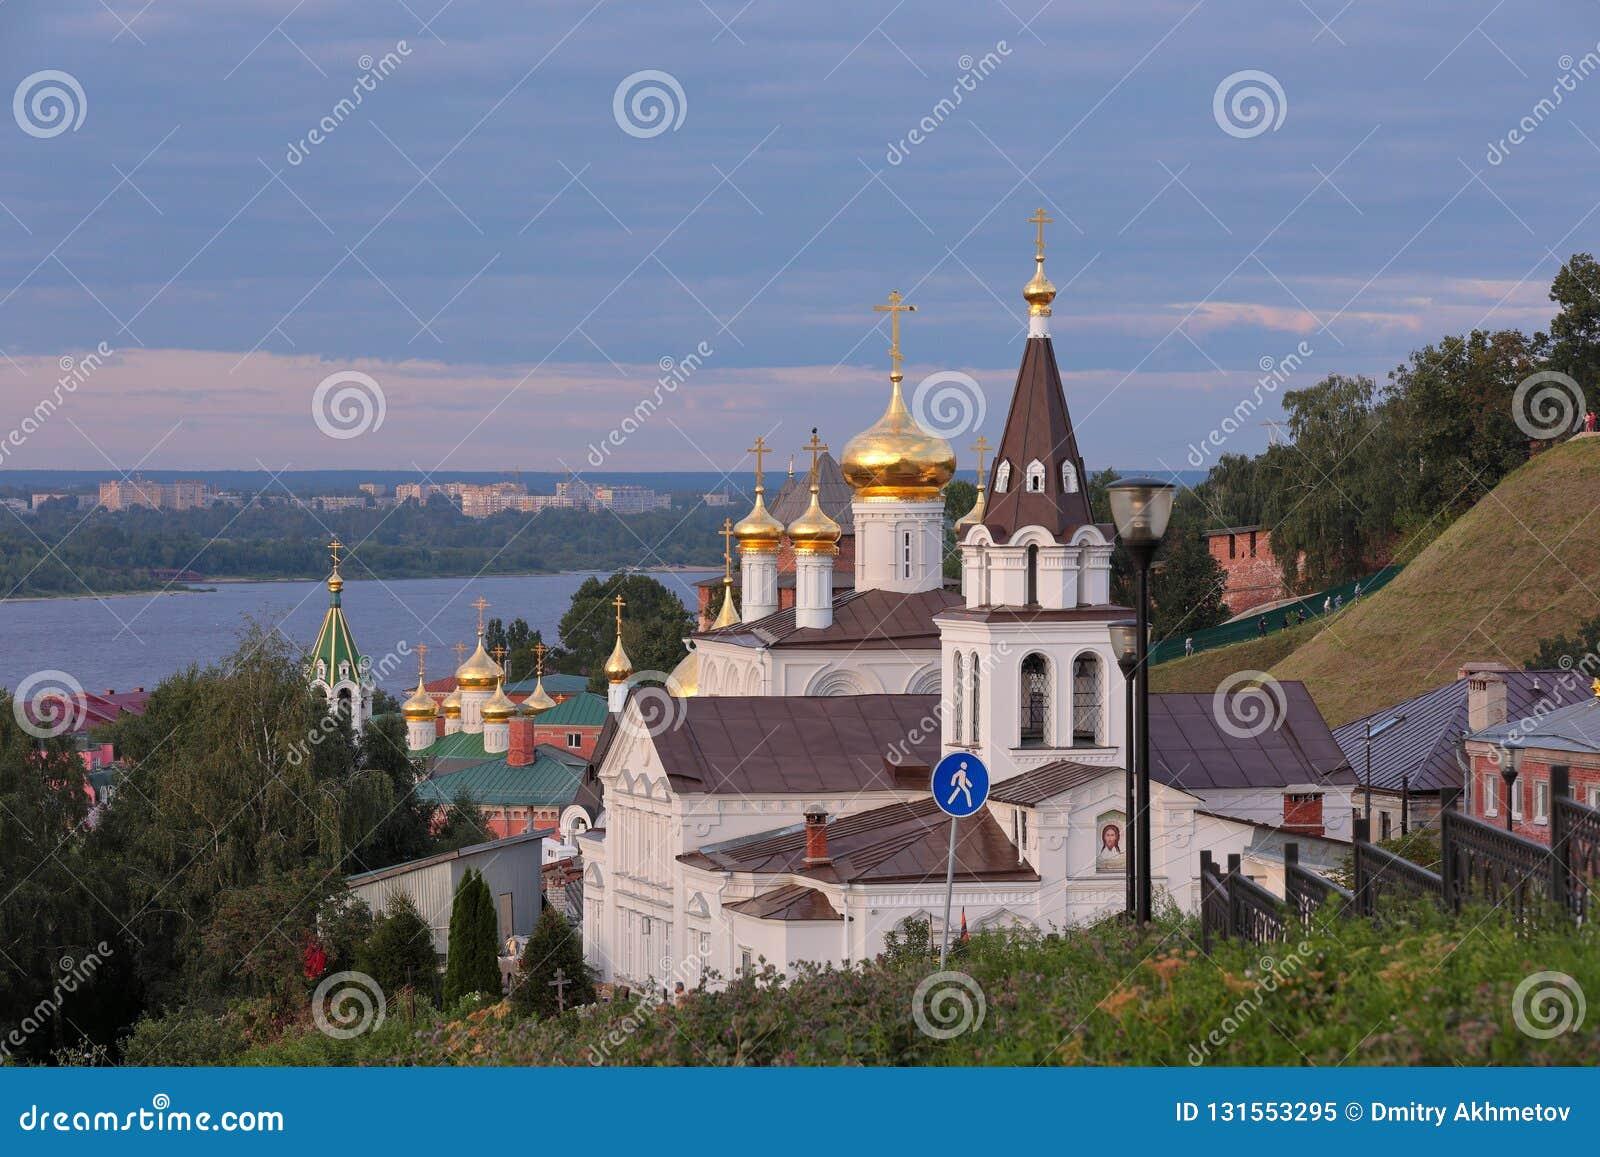 Scenic view at churches above Volga river